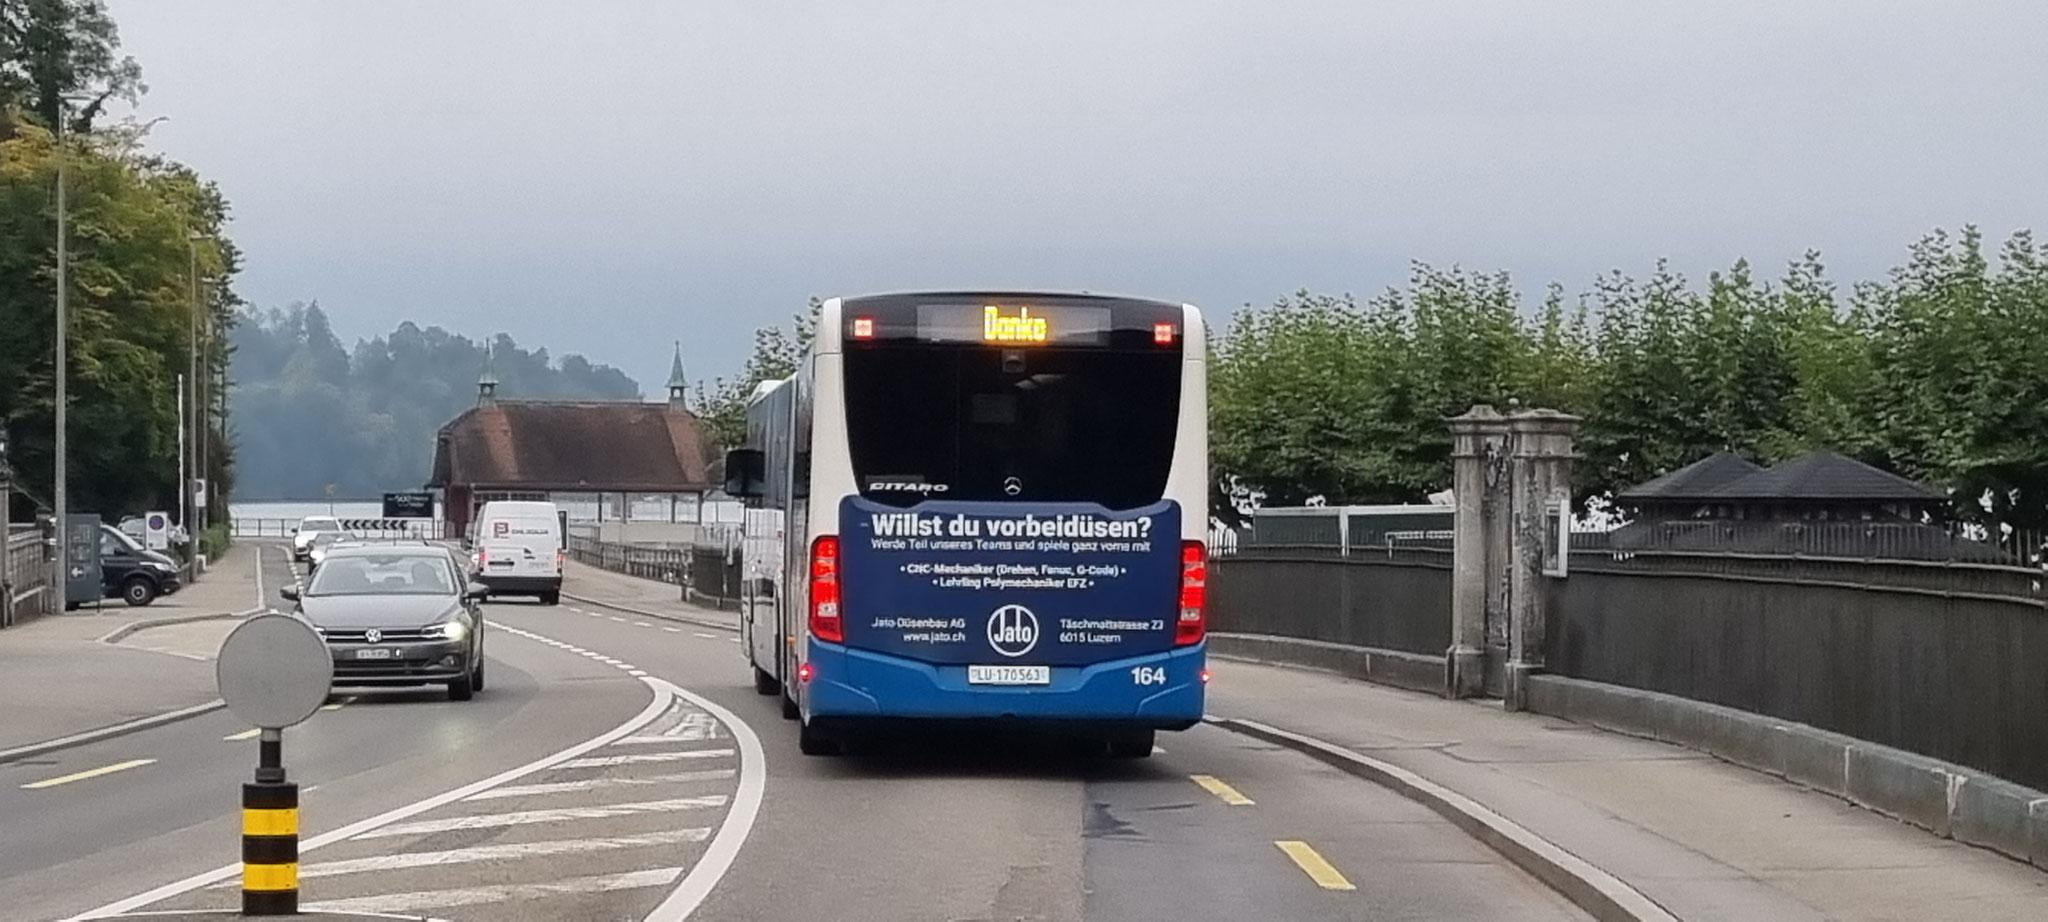 Bitte - immer gerne liebe Bus-Chauffeure :-)